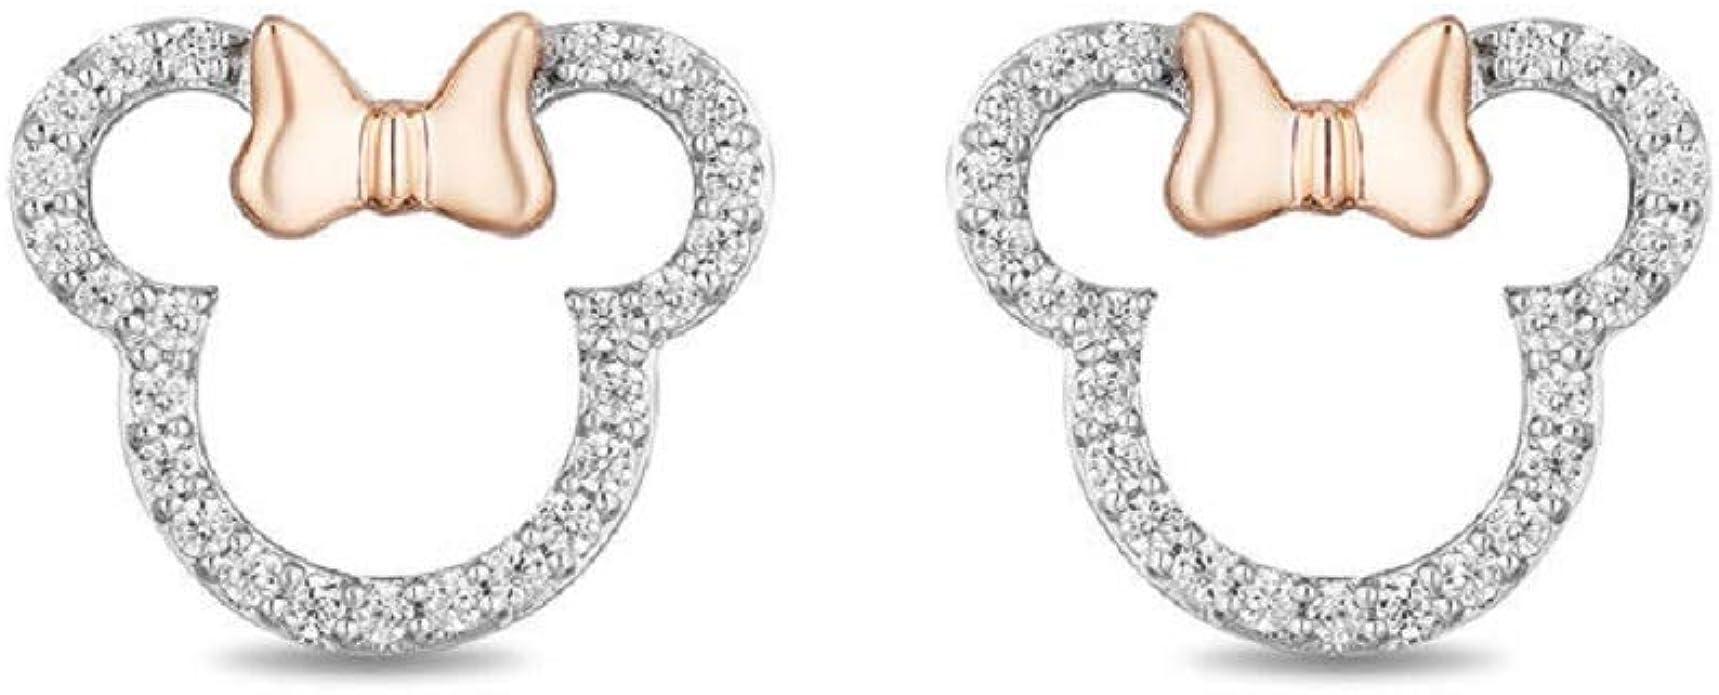 925 Sterling Silver Dangle Drop Leaf Earrings Studs in Enamel Gift for Mom on Mothers Day